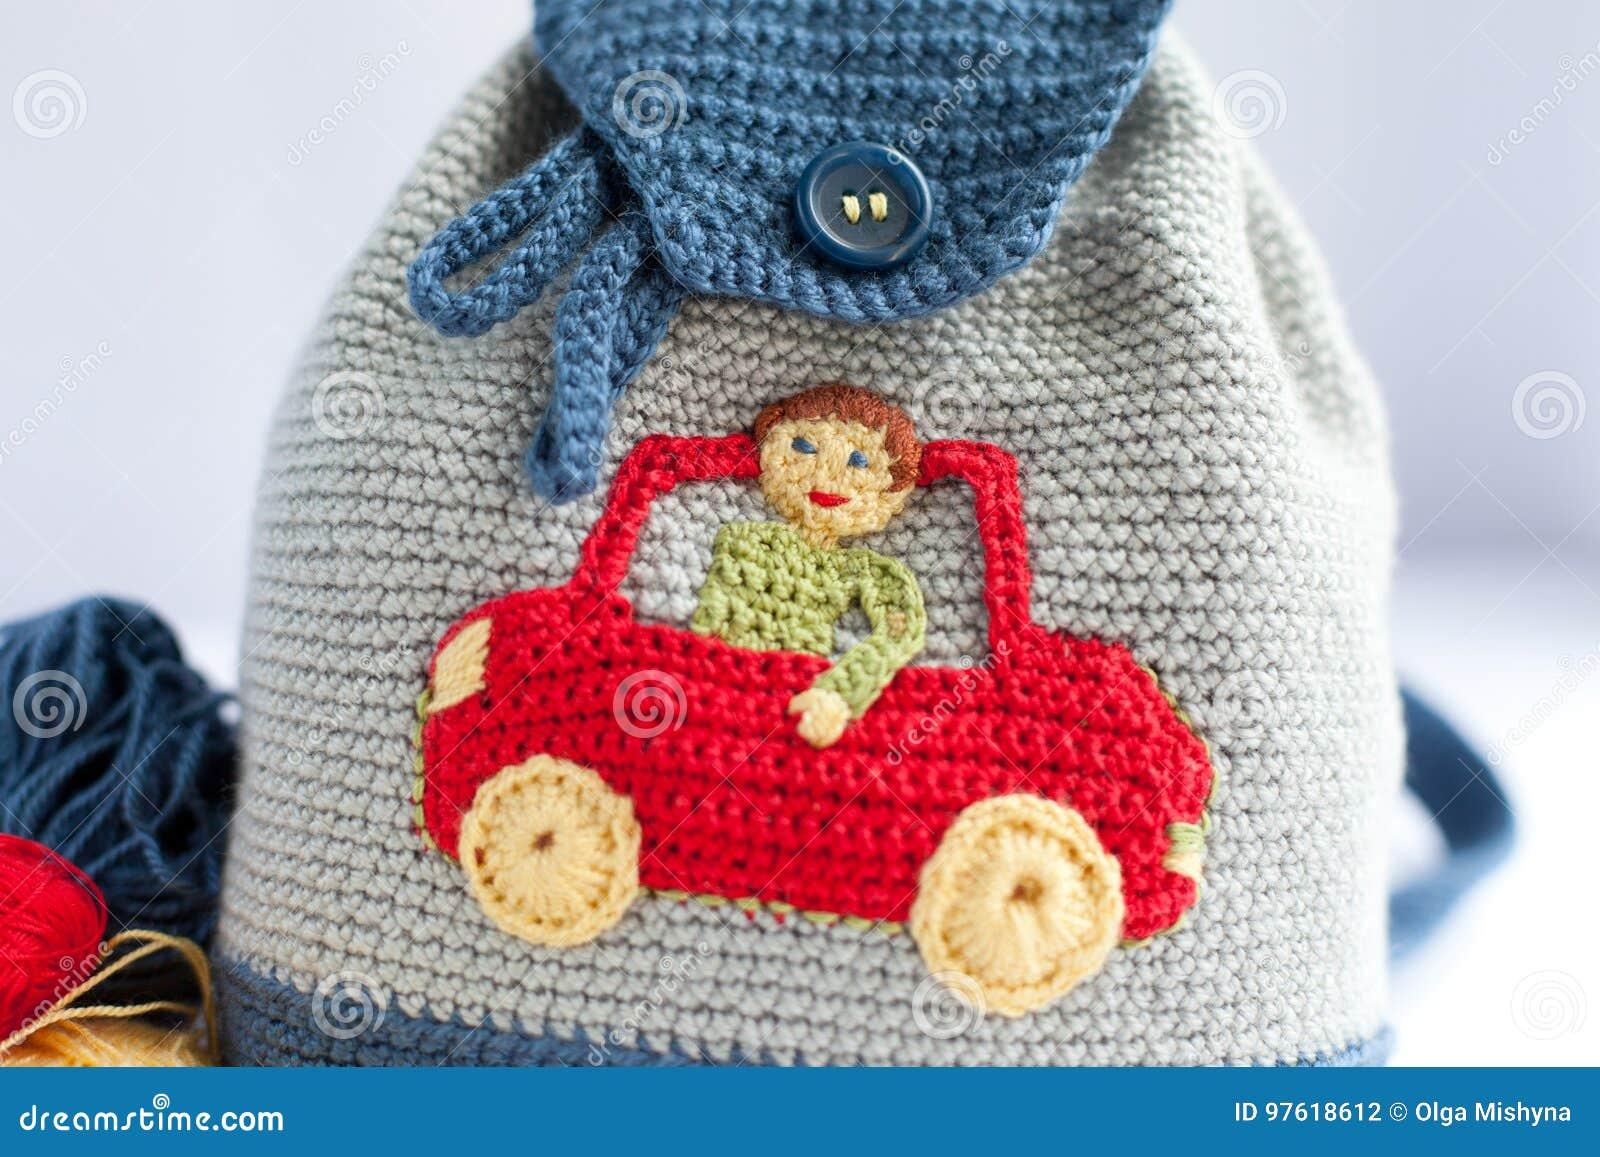 d2d8935c84 Χειροποίητο πλεκτό σακίδιο πλάτης και ένα καπέλο για ένα παιδί στο άσπρο  υπόβαθρο